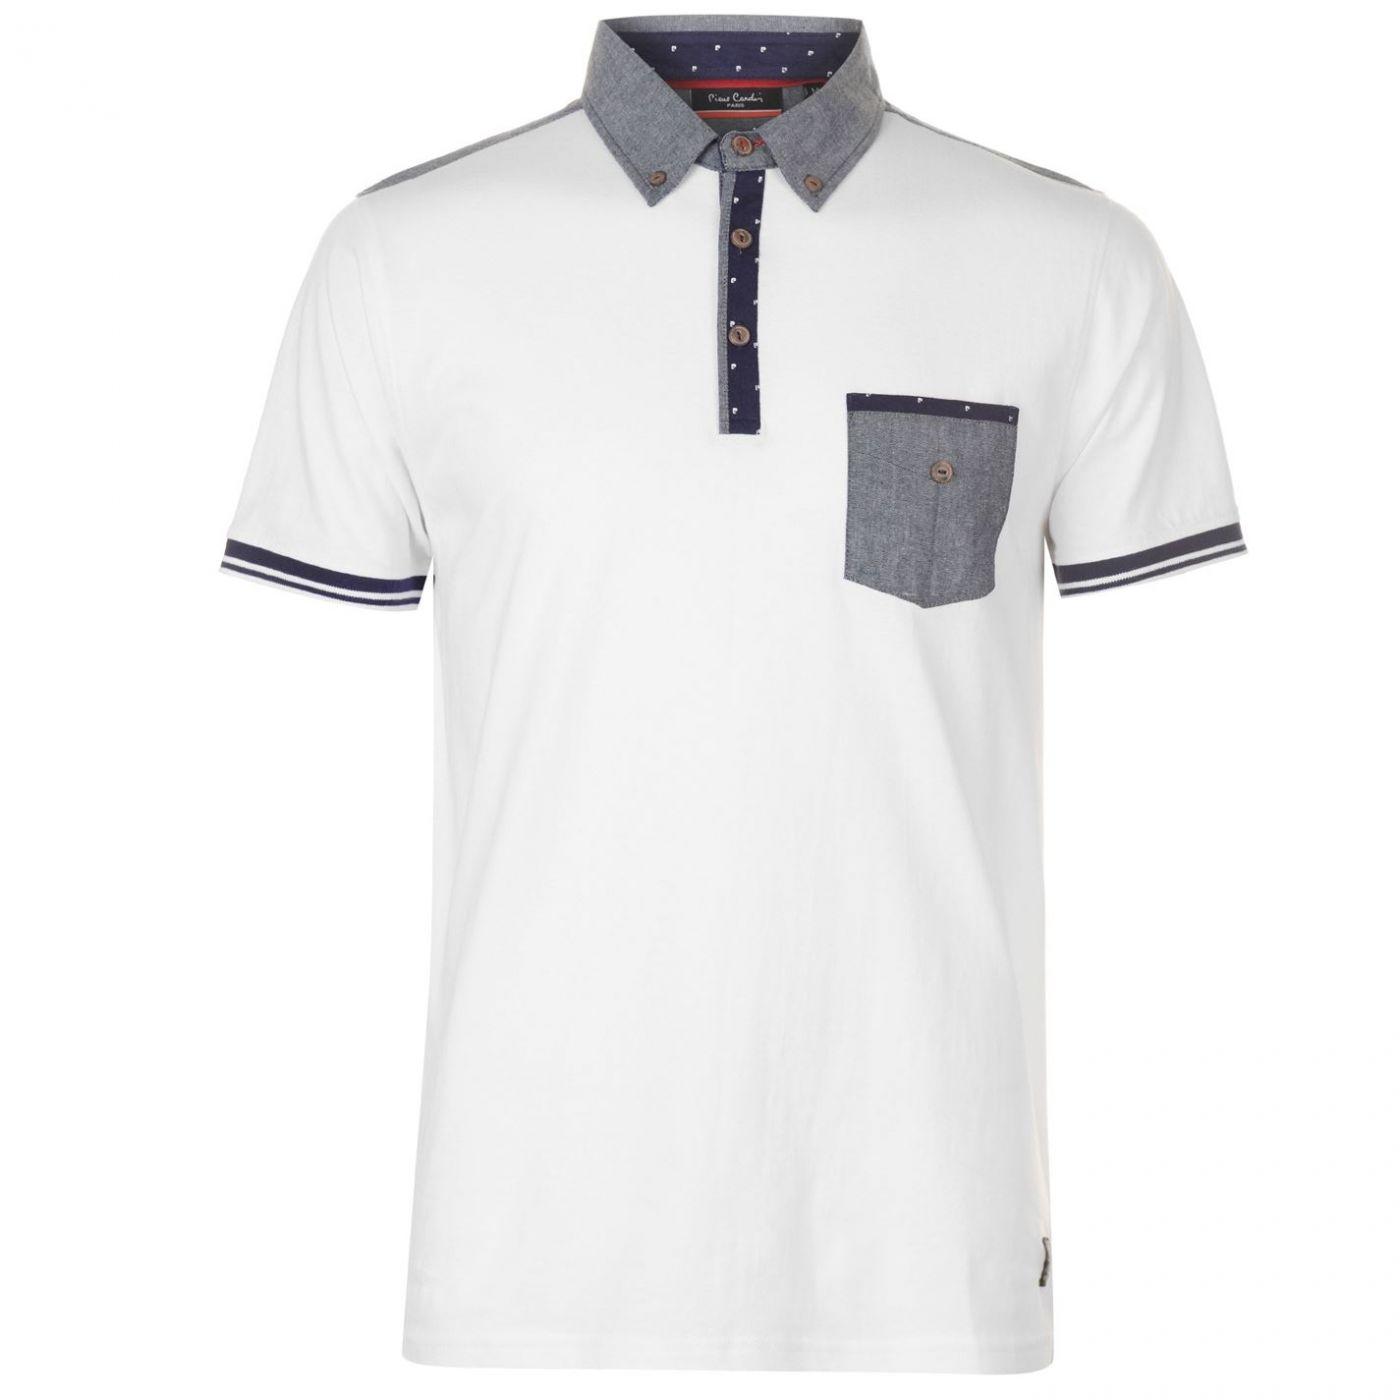 30424aca3f12 Pierre Cardin Printed Trim Polo Shirt Mens - FACTCOOL